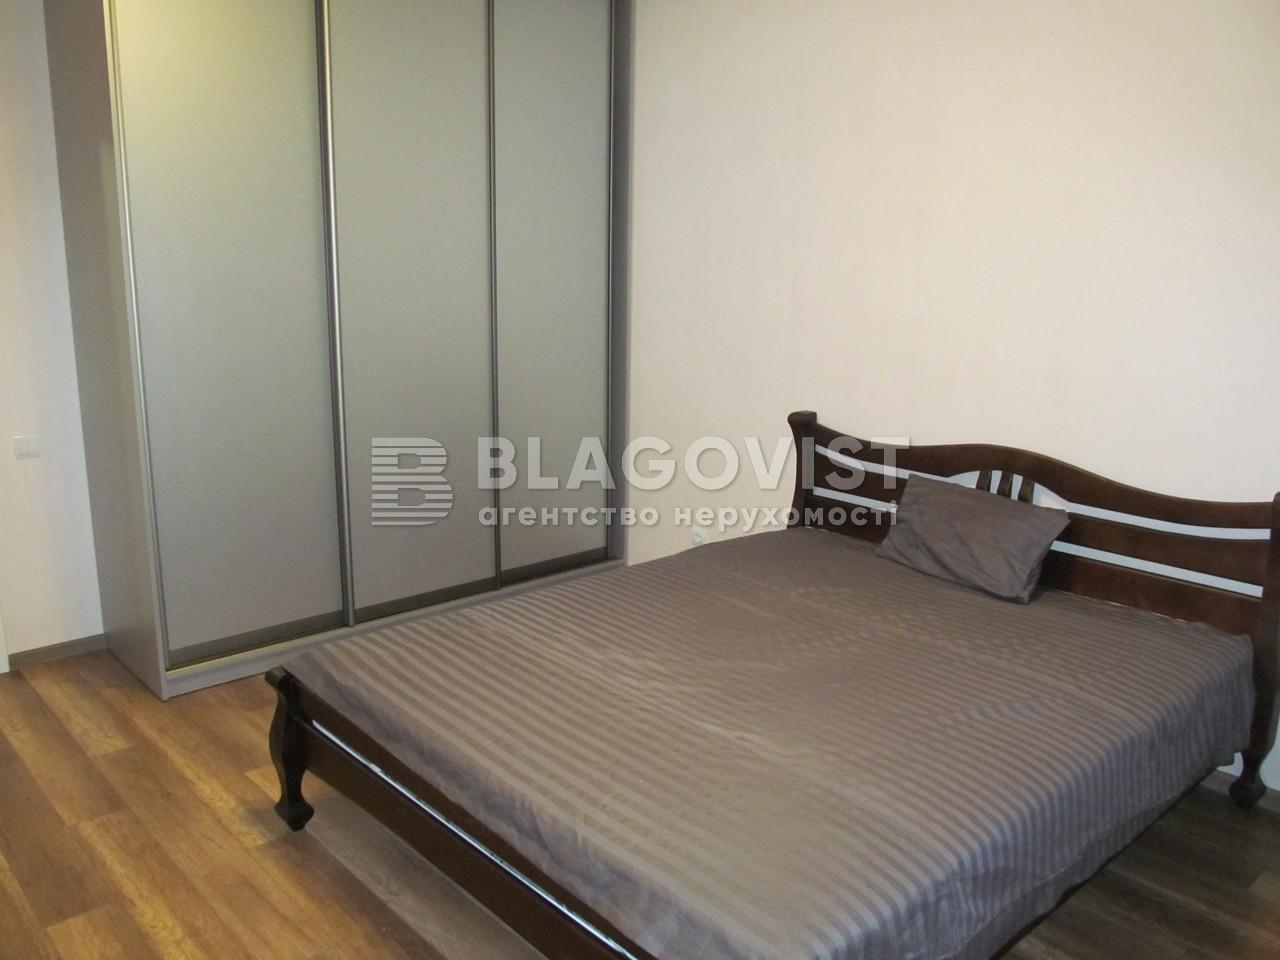 Квартира F-41048, Златоустовская, 34, Киев - Фото 8